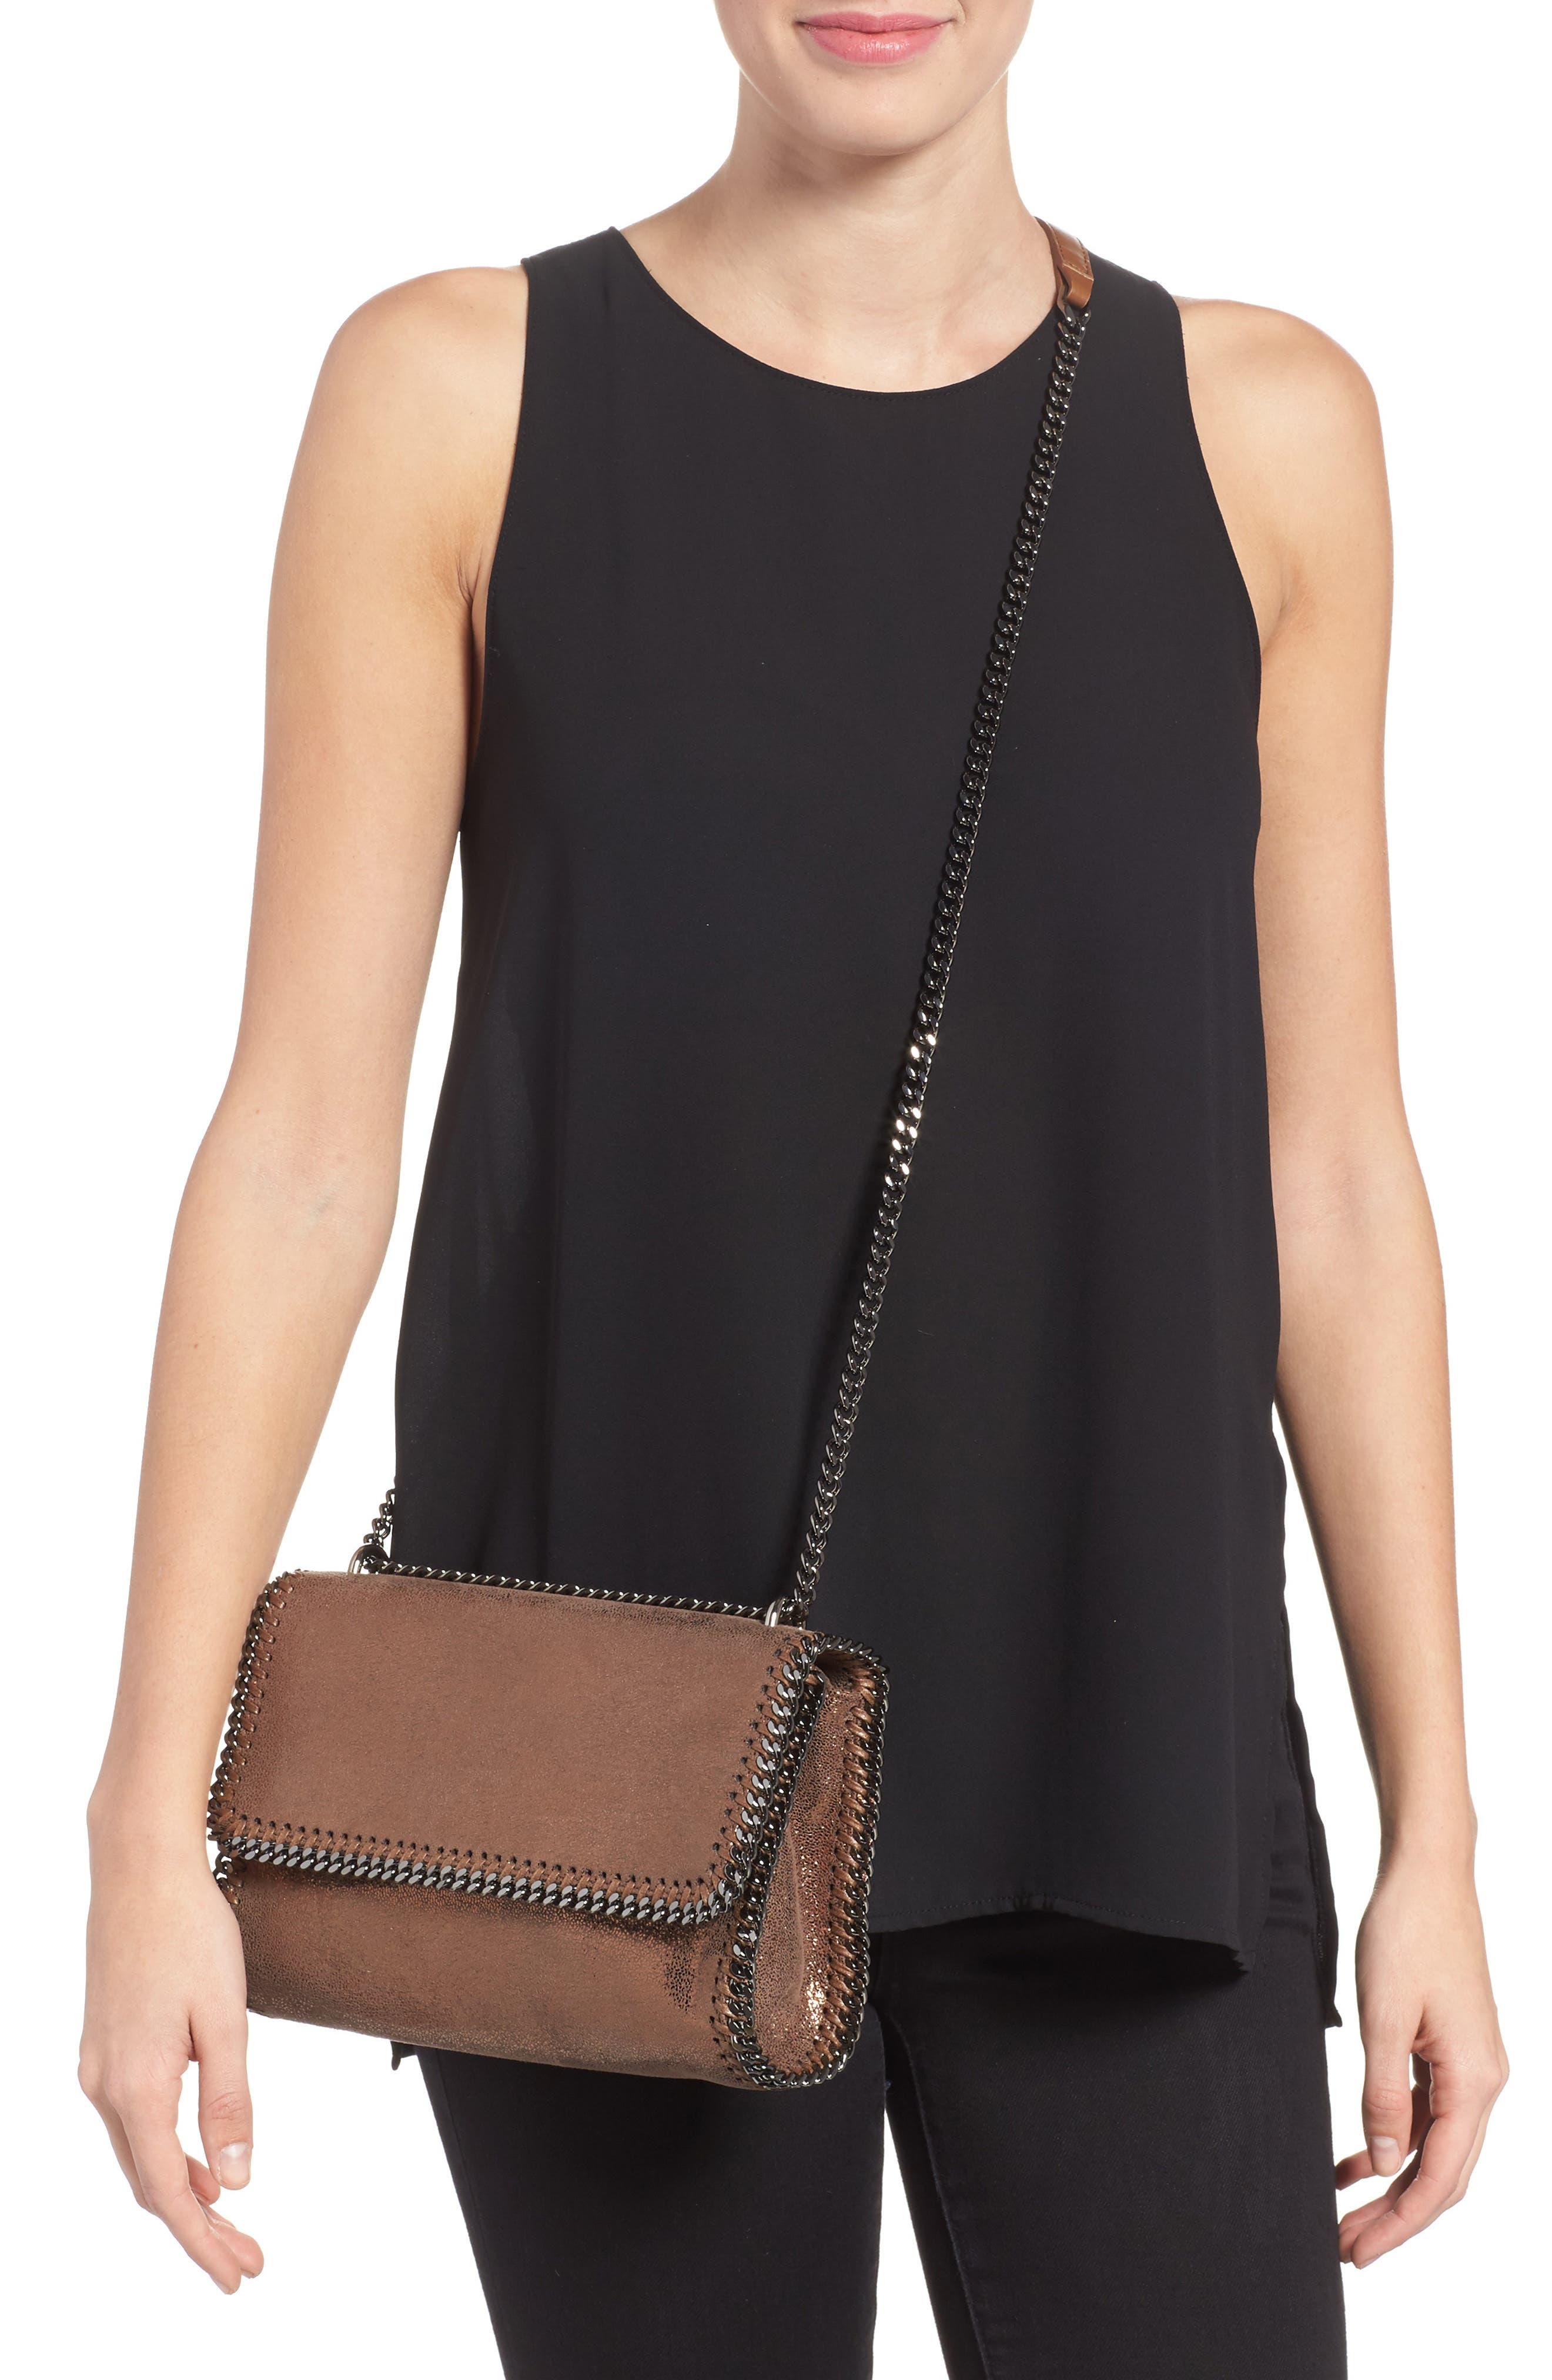 Falabella Metallic Faux Leather Convertible Shoulder Bag,                             Alternate thumbnail 2, color,                             200